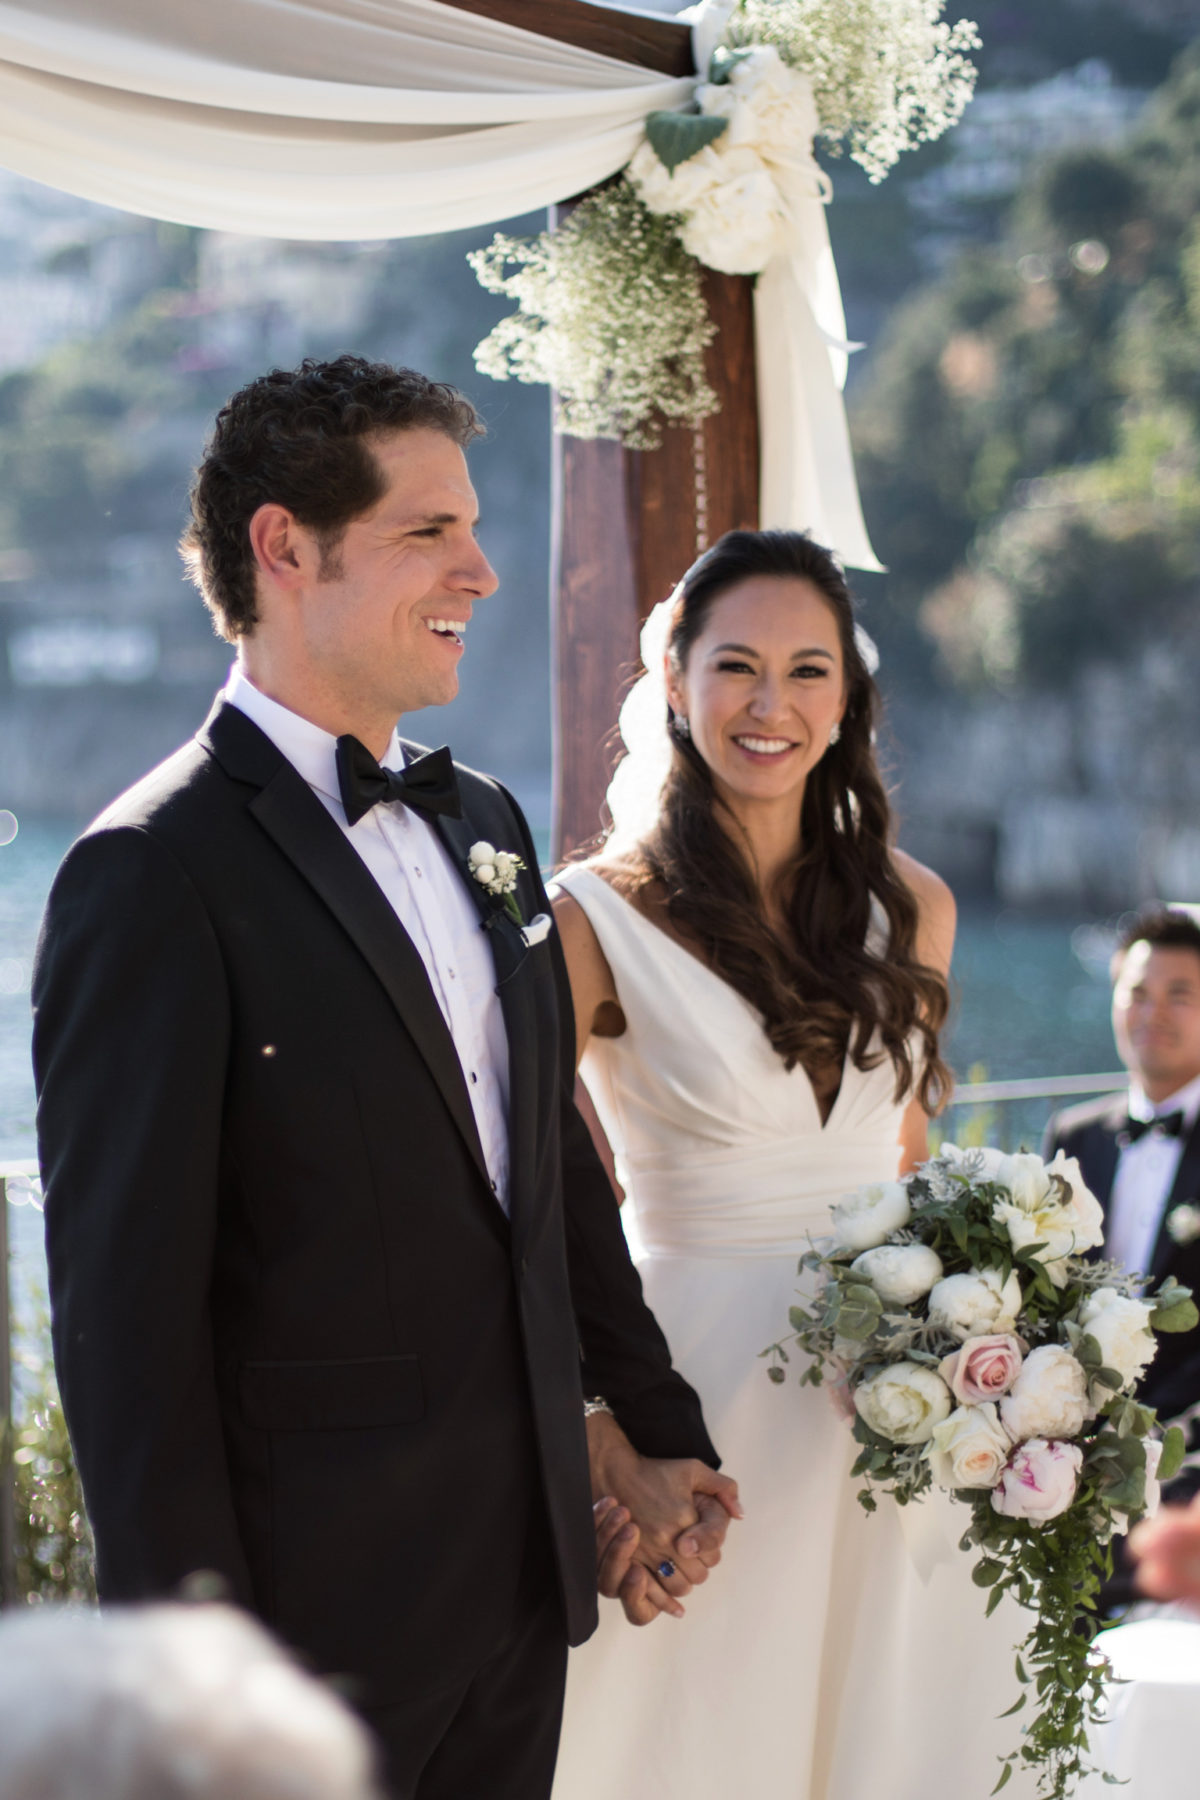 Nathalie and Benjamin Wedding in Positano Italy (29)